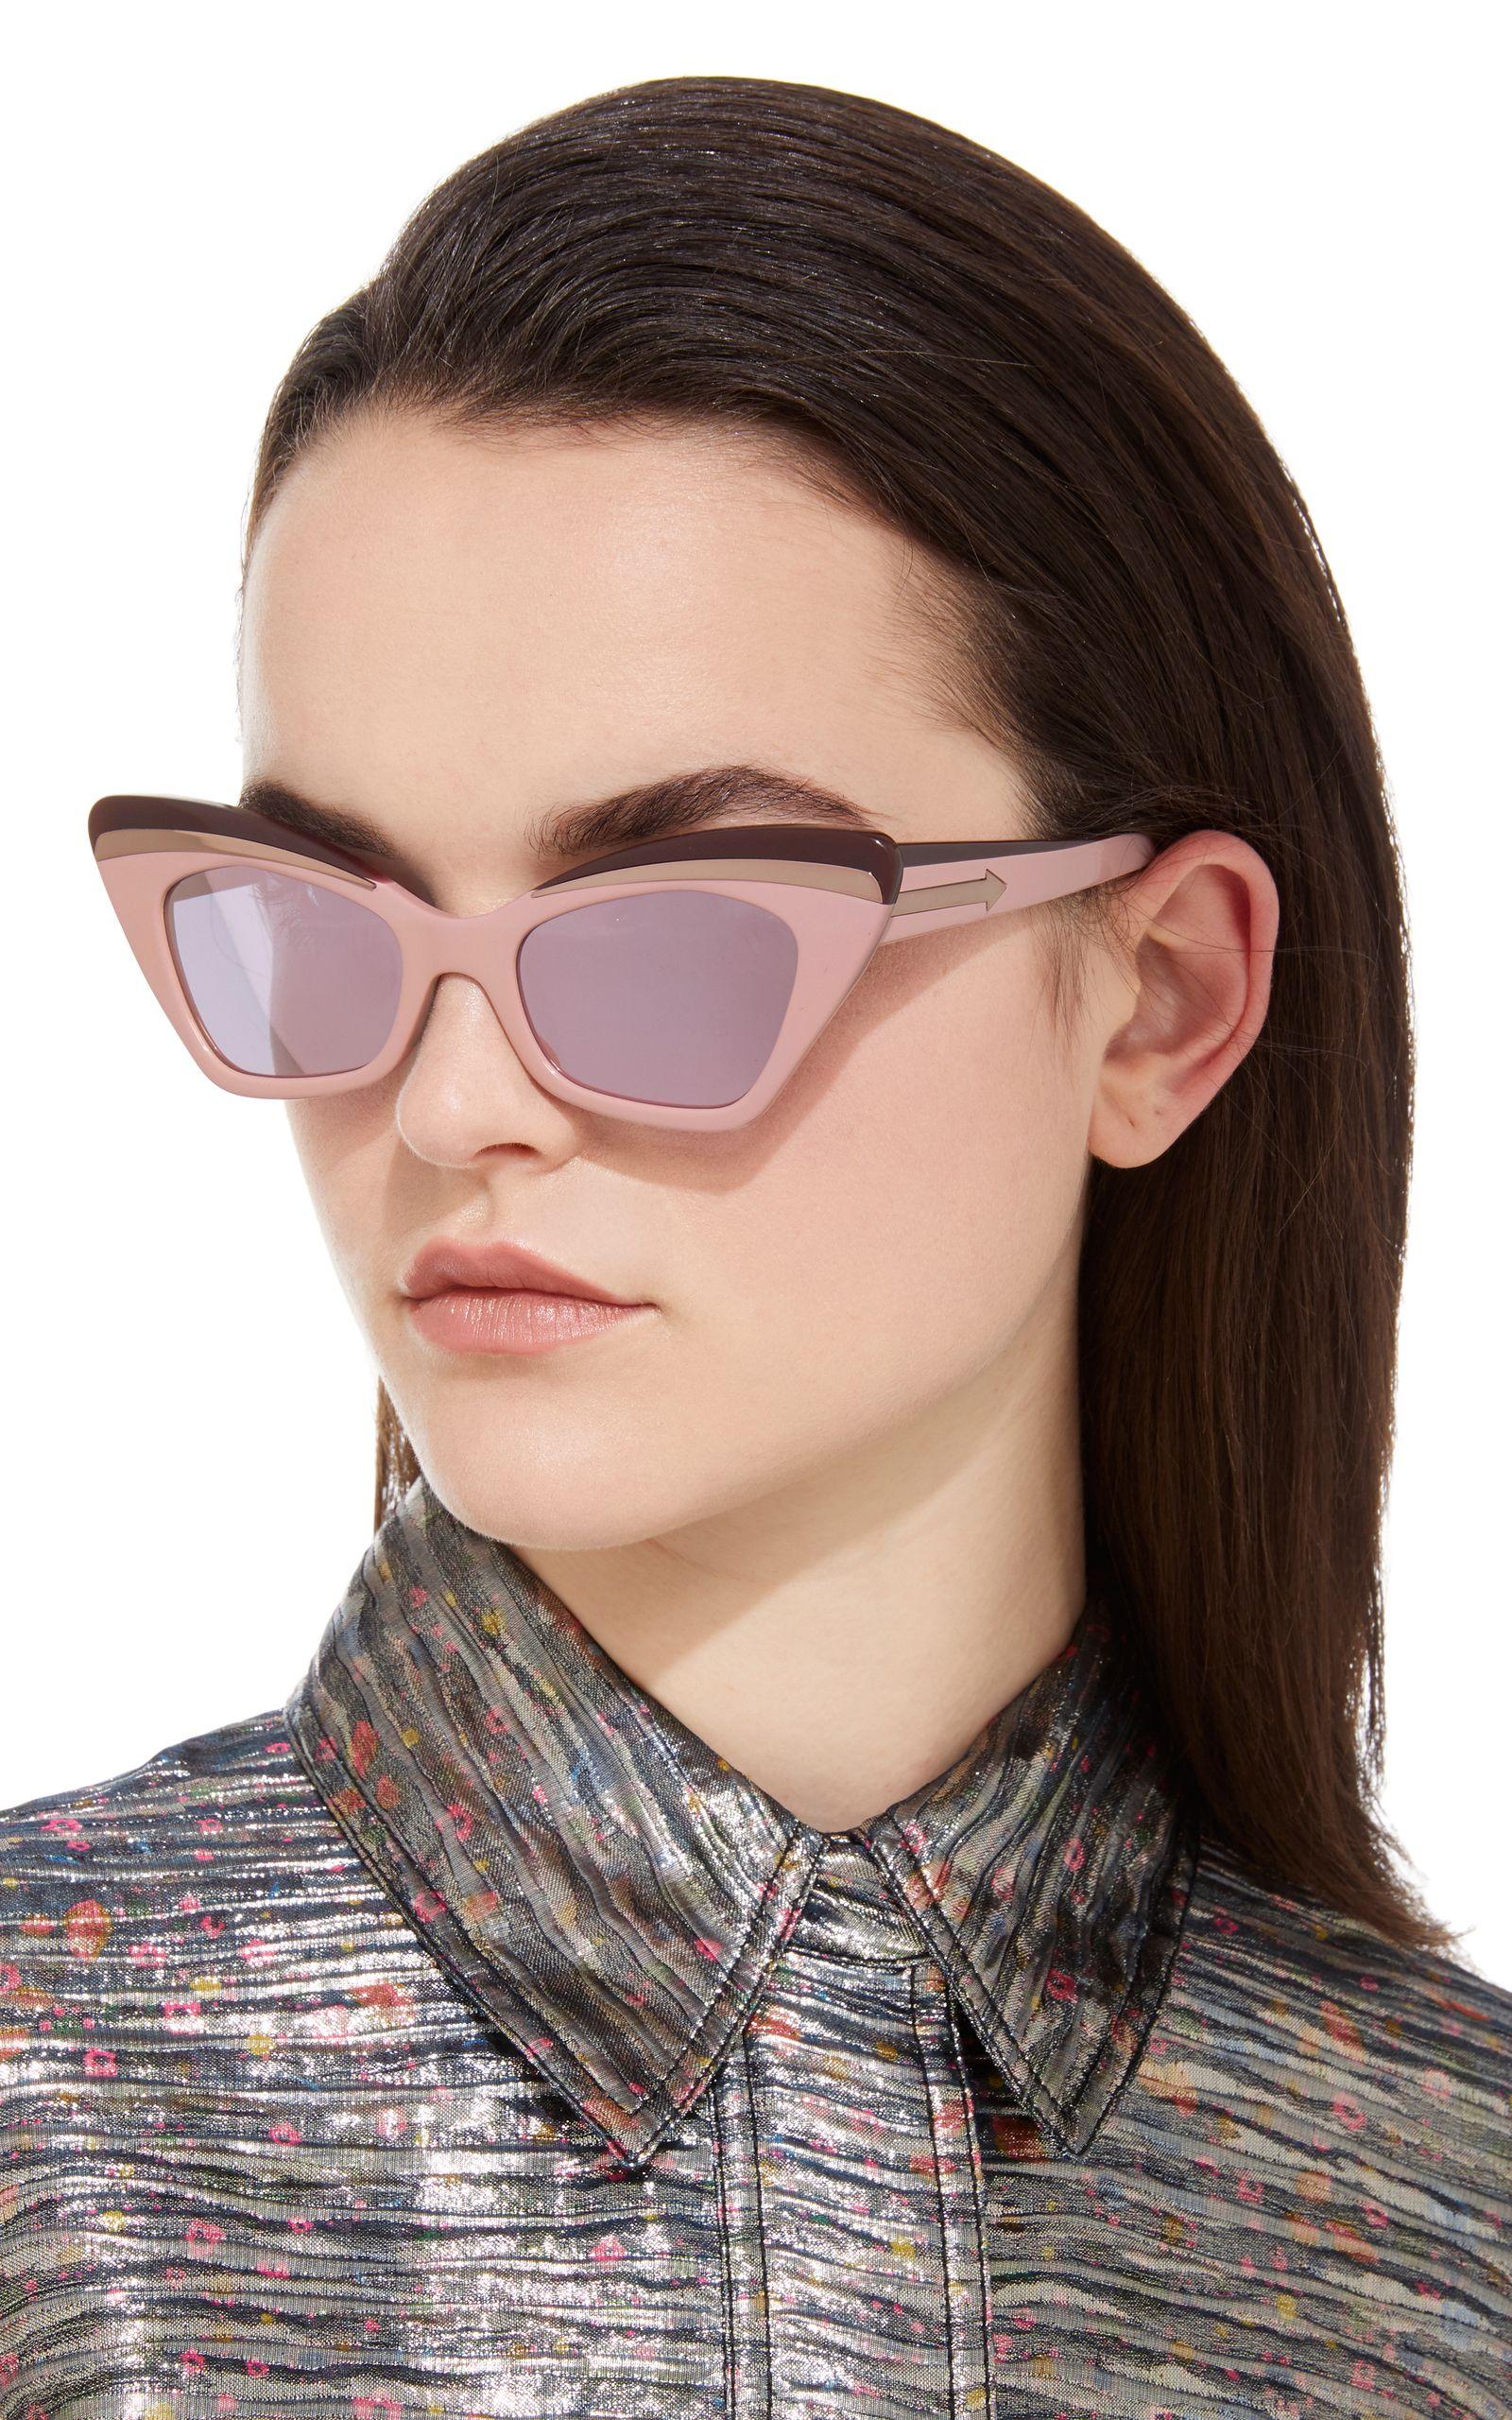 e71ada6cfcbb Babou Blush Cat-Eye Acetate and Metal Sunglasses by KAREN WALKER Now  Available on Moda Operandi